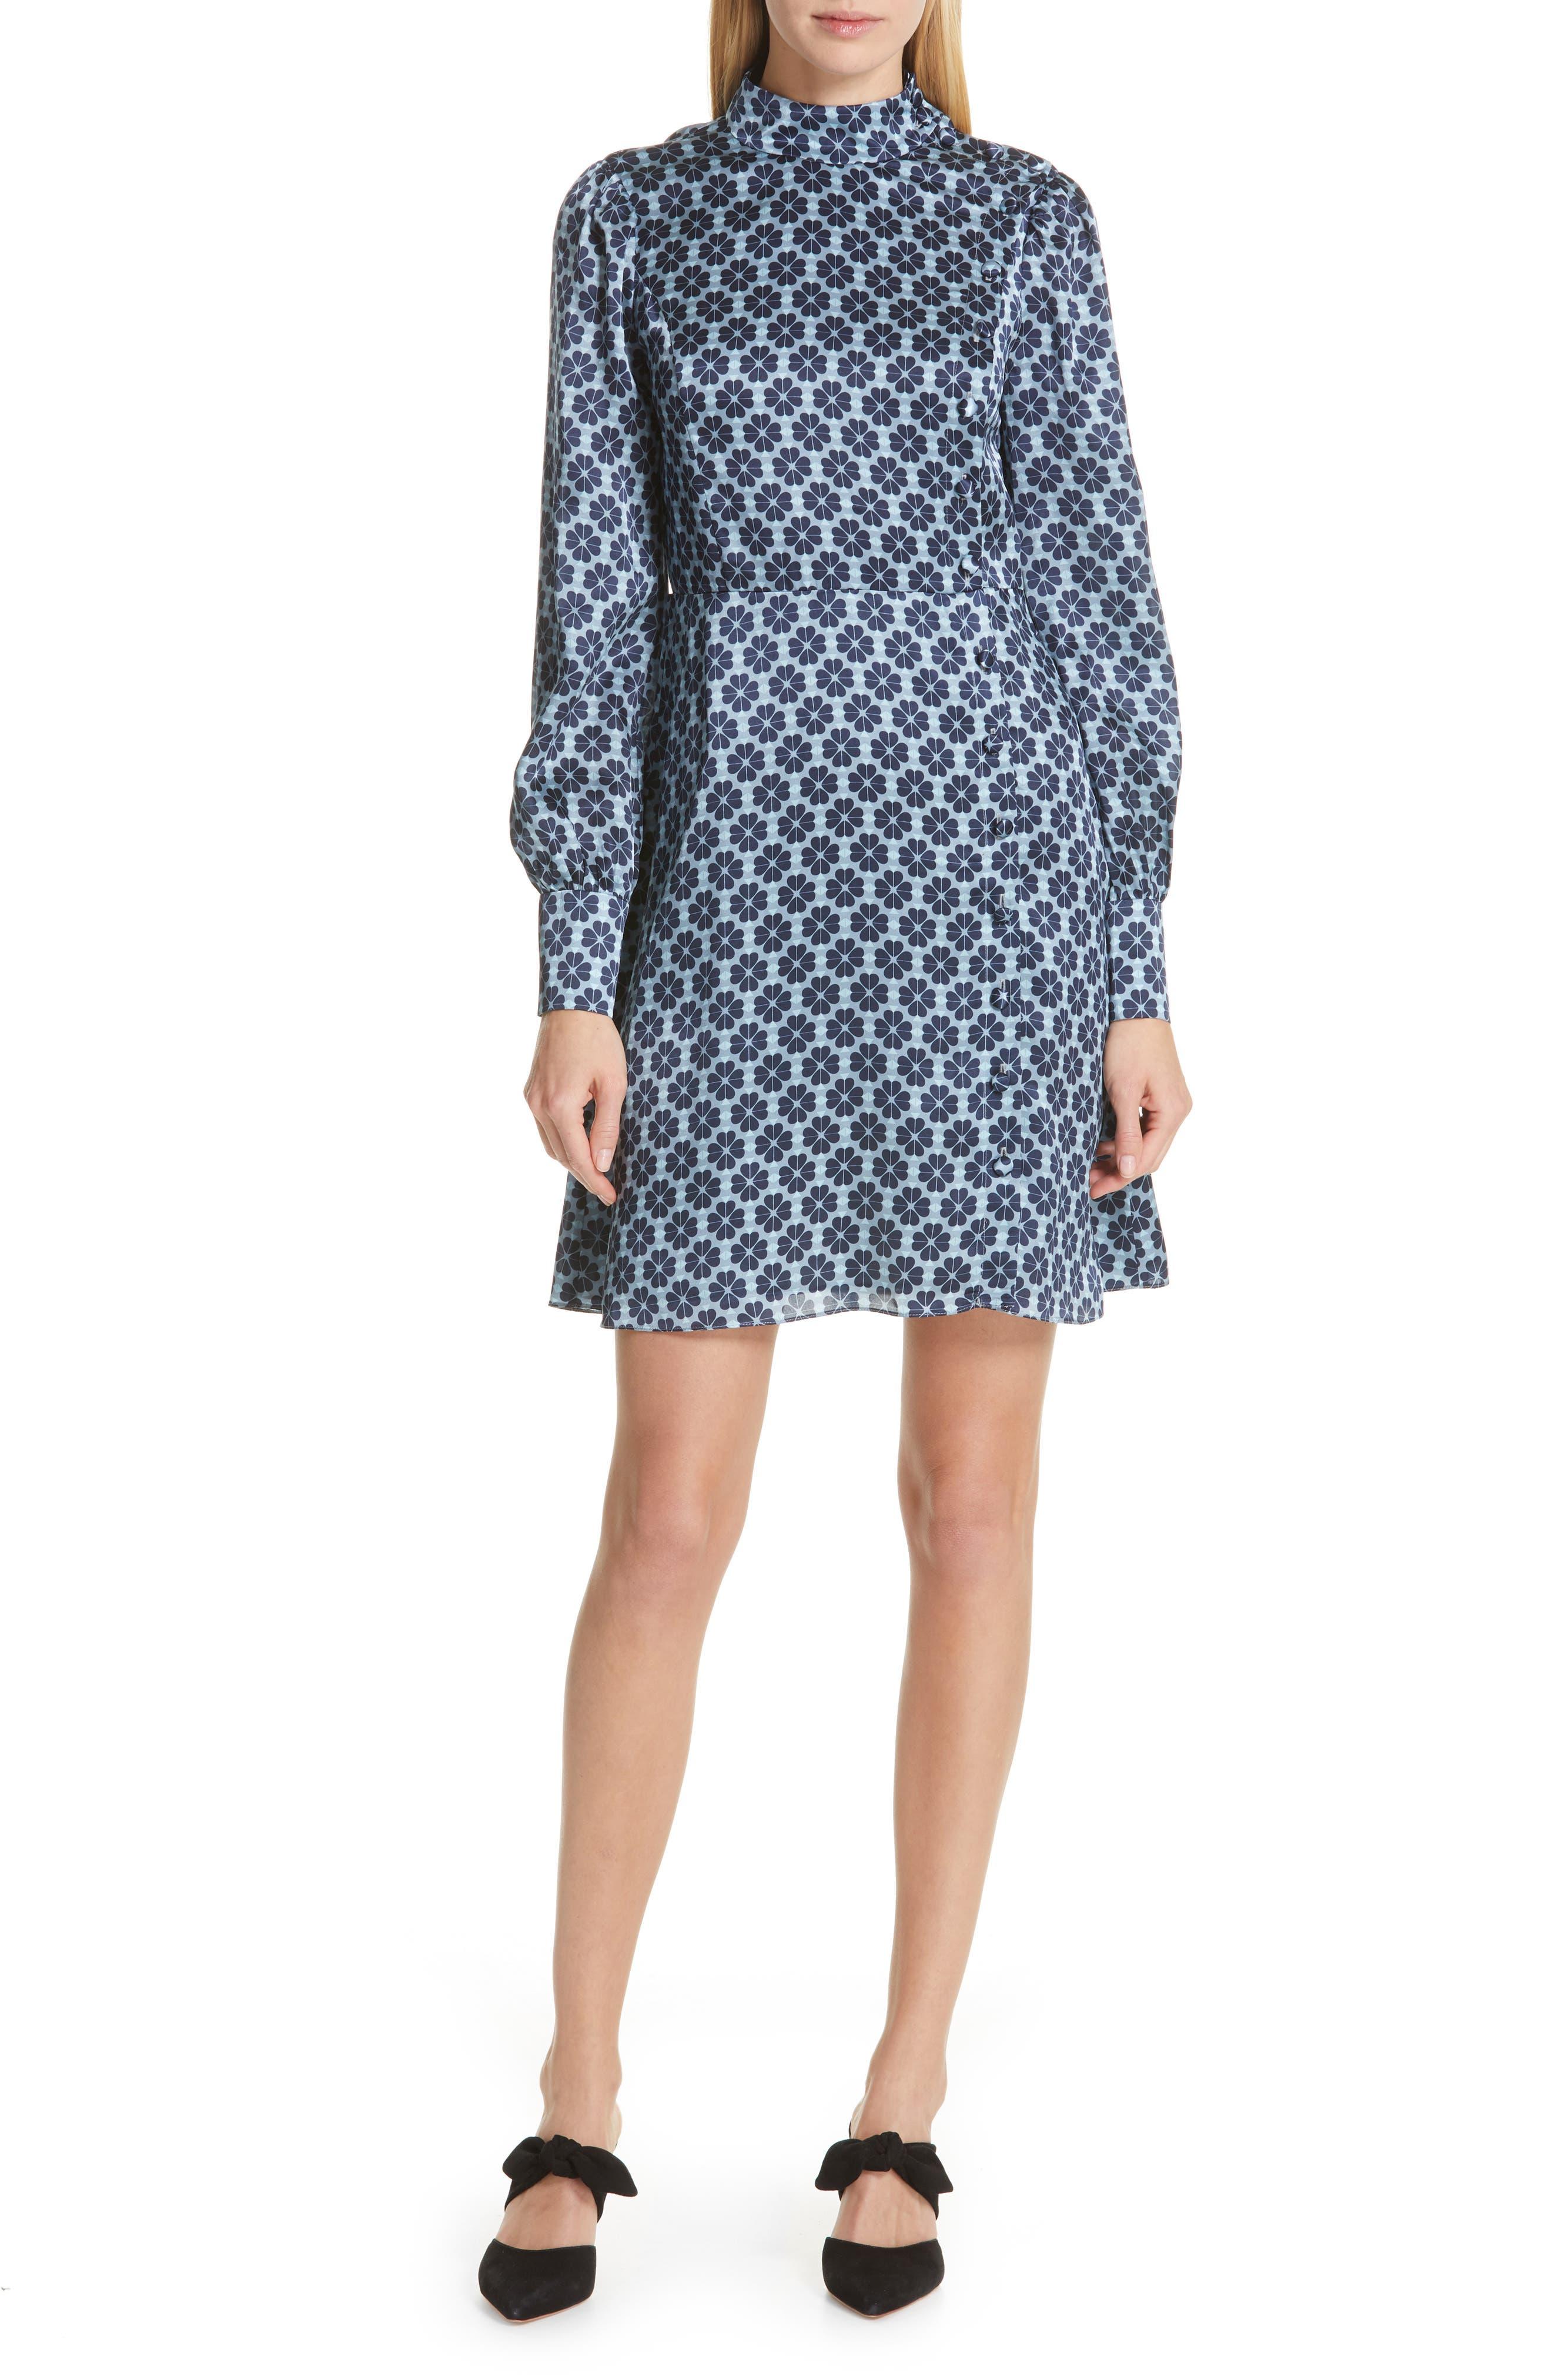 Kate Spade New York Floral Spade Silk Fit & Flare Dress